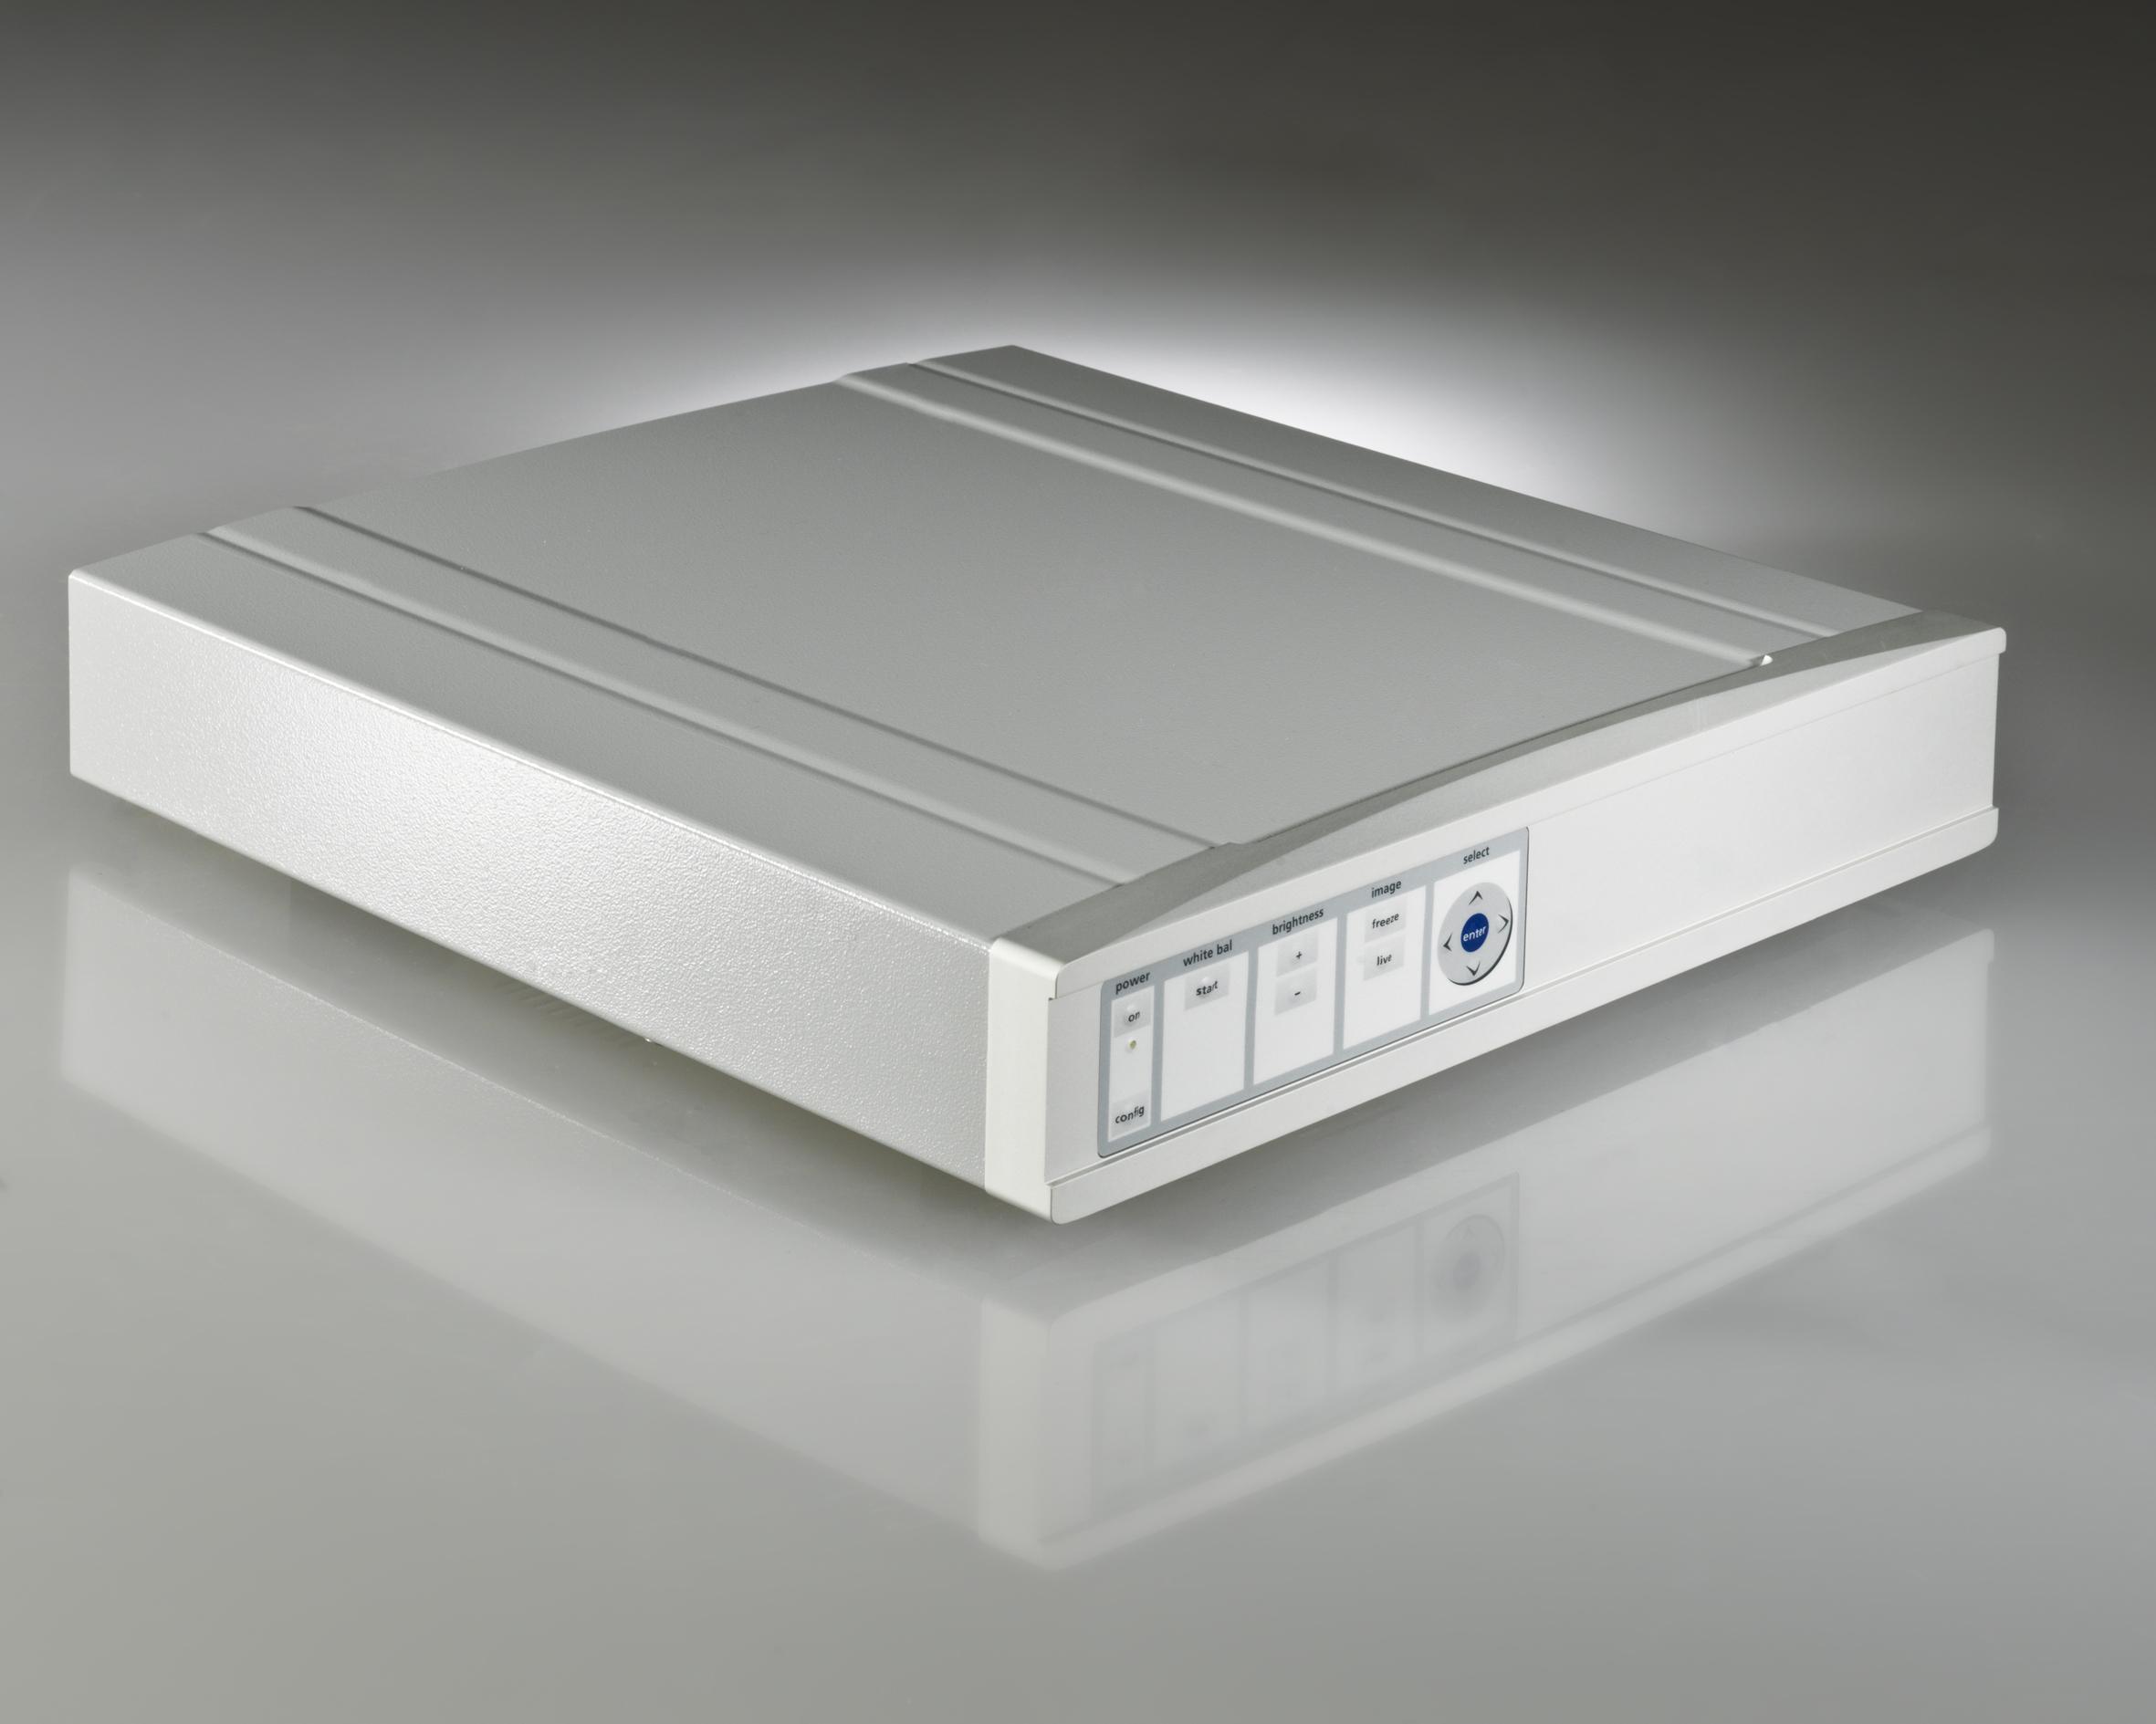 Techpilot | B&S Blech mit System GmbH & Co KG